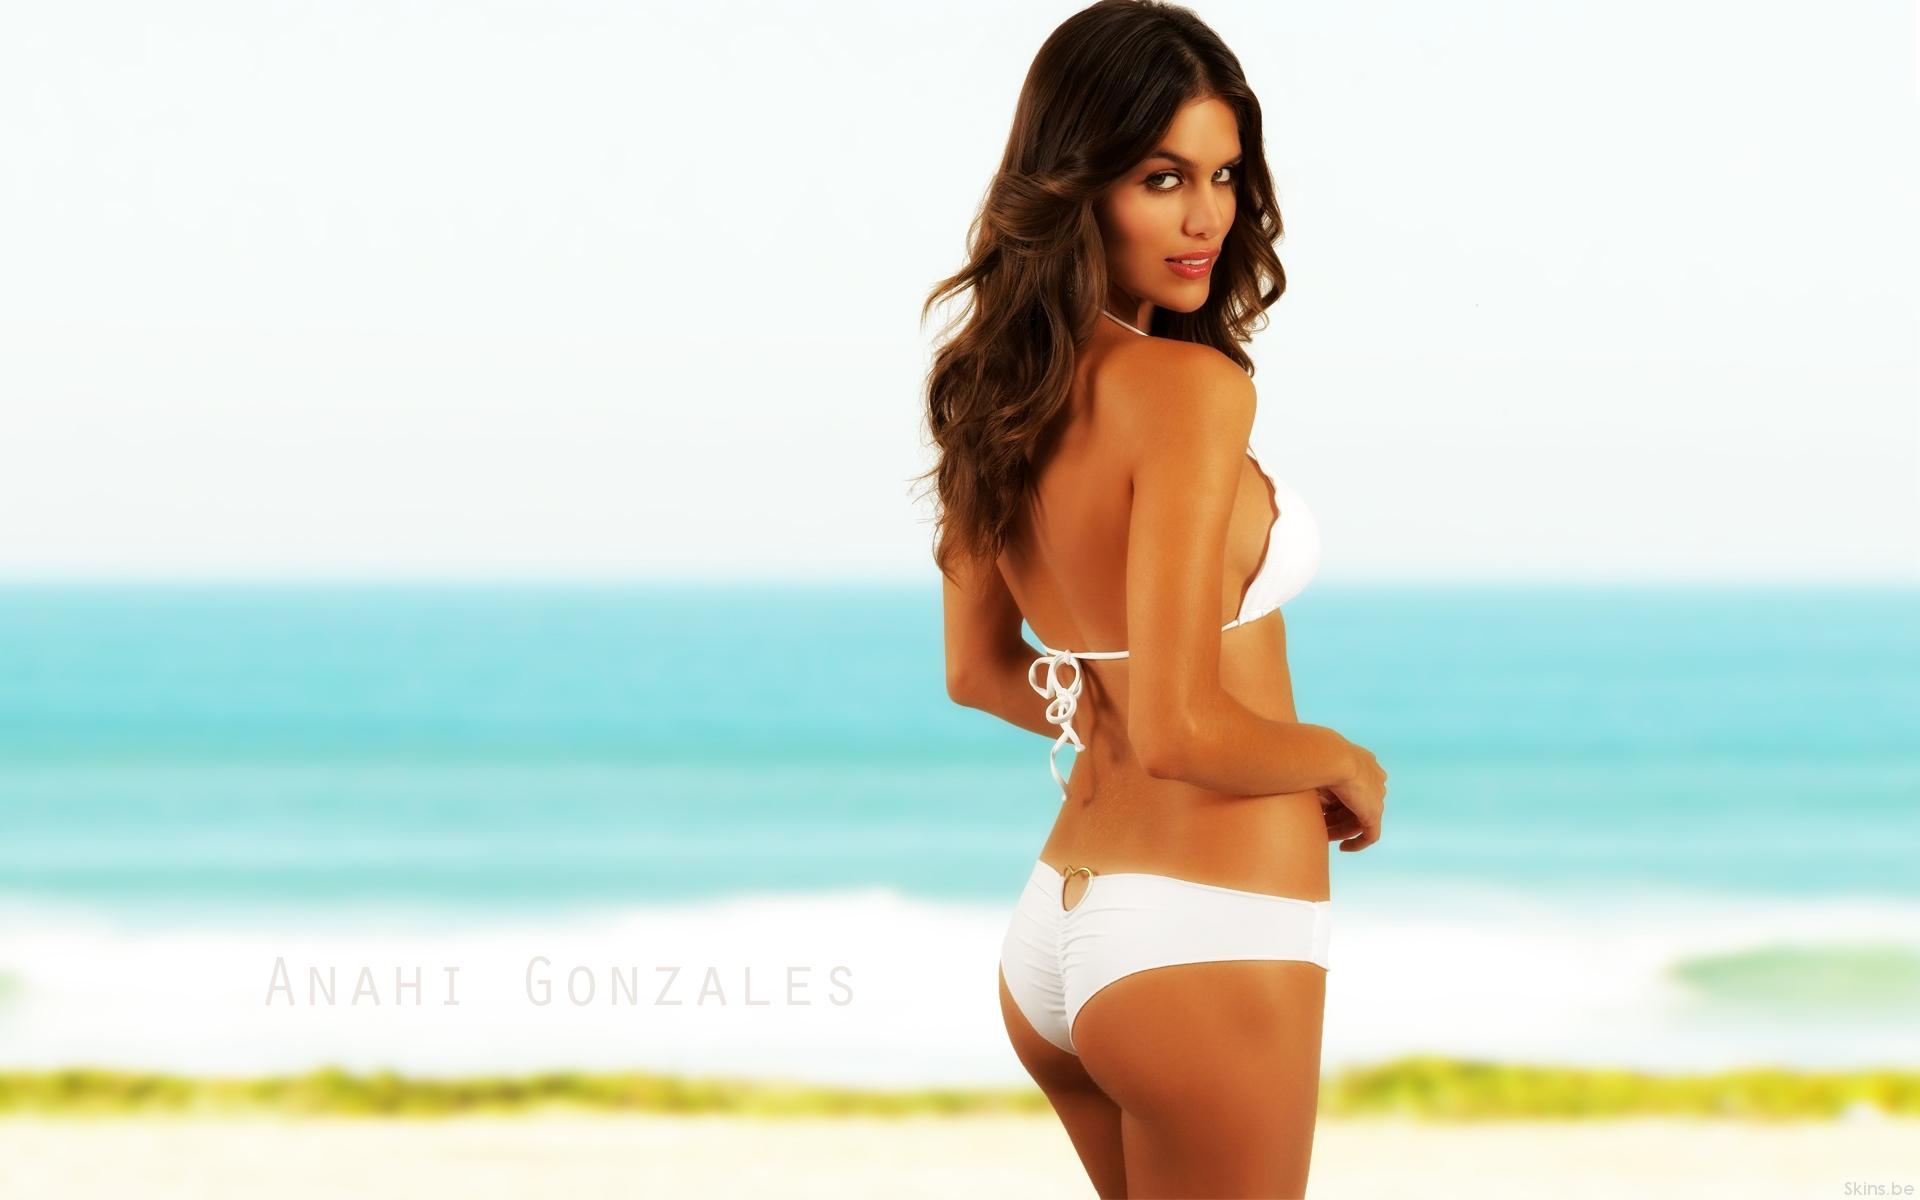 Anahi Gonzales wallpaper (#38358)